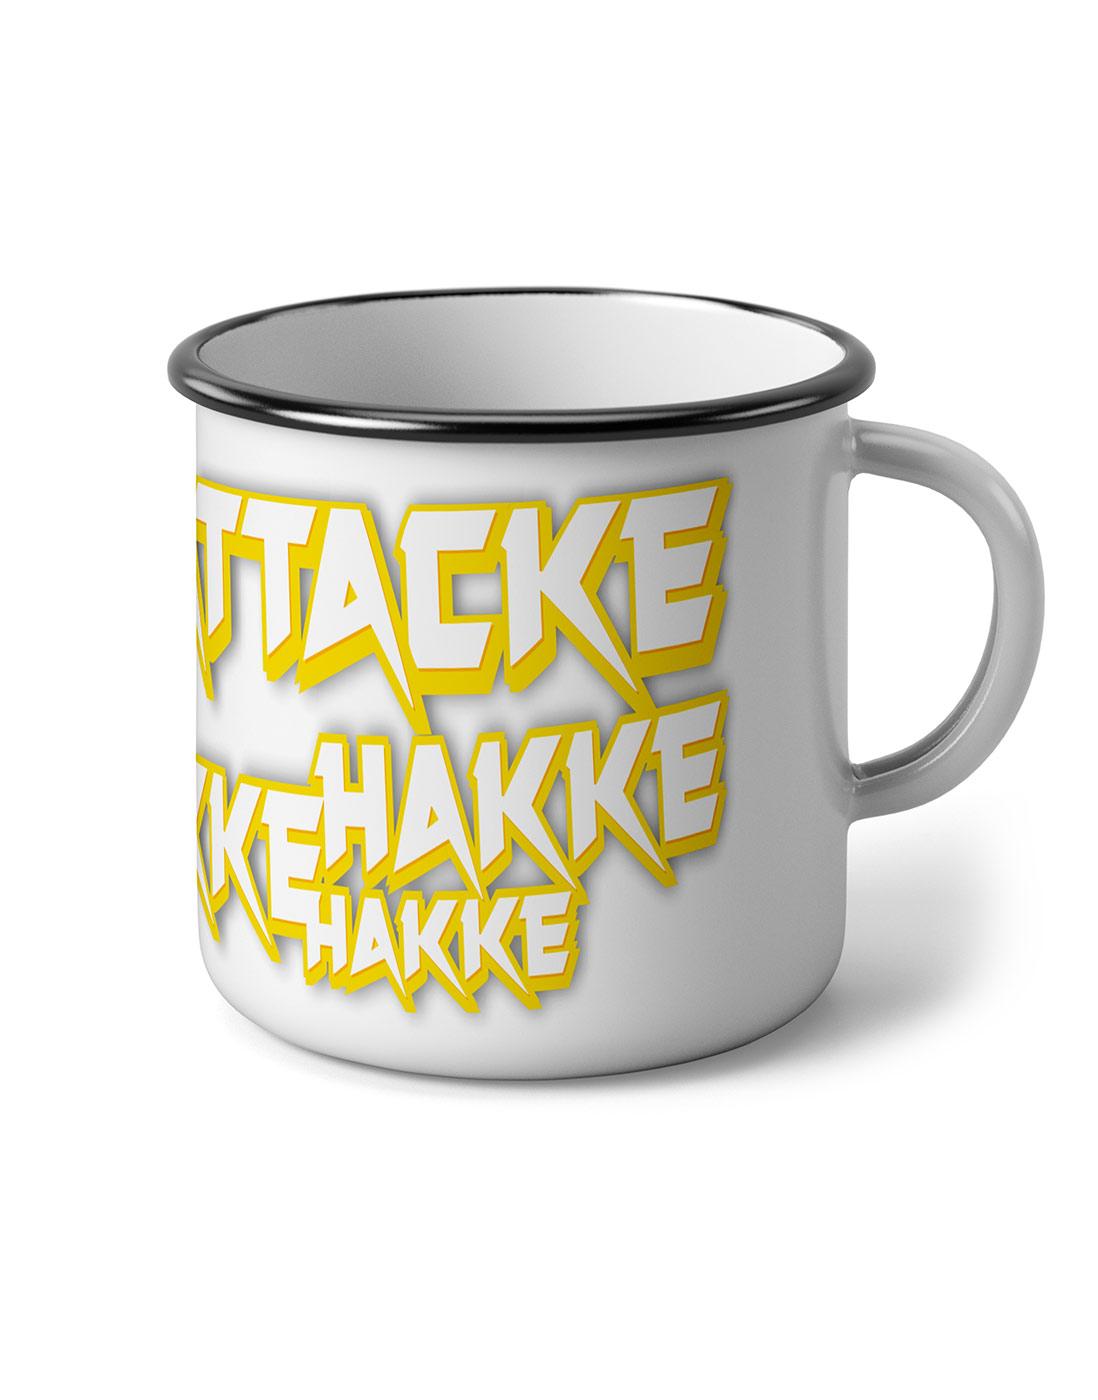 Hakke Hakke Hakke Emaillebecher mehrfarbig auf weiß/schwarz